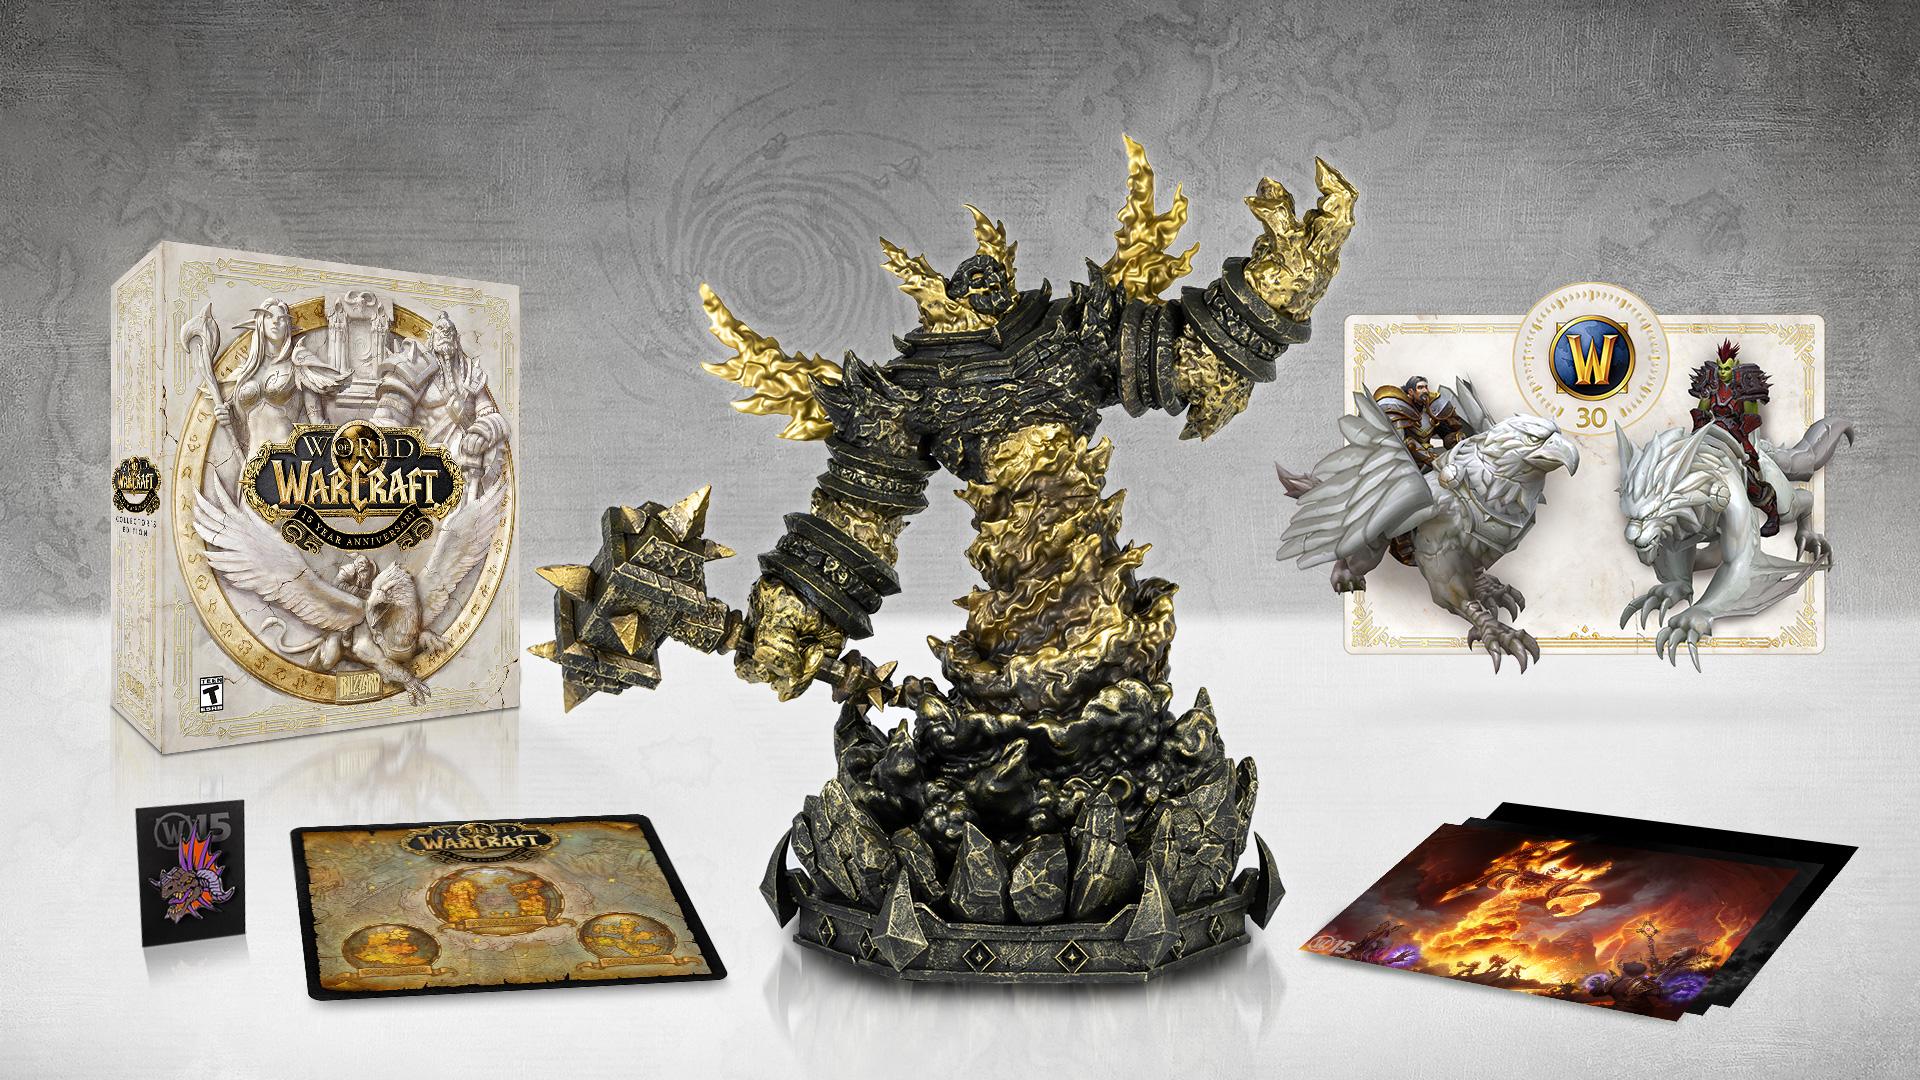 World of Warcraft 15th Anniversary CE